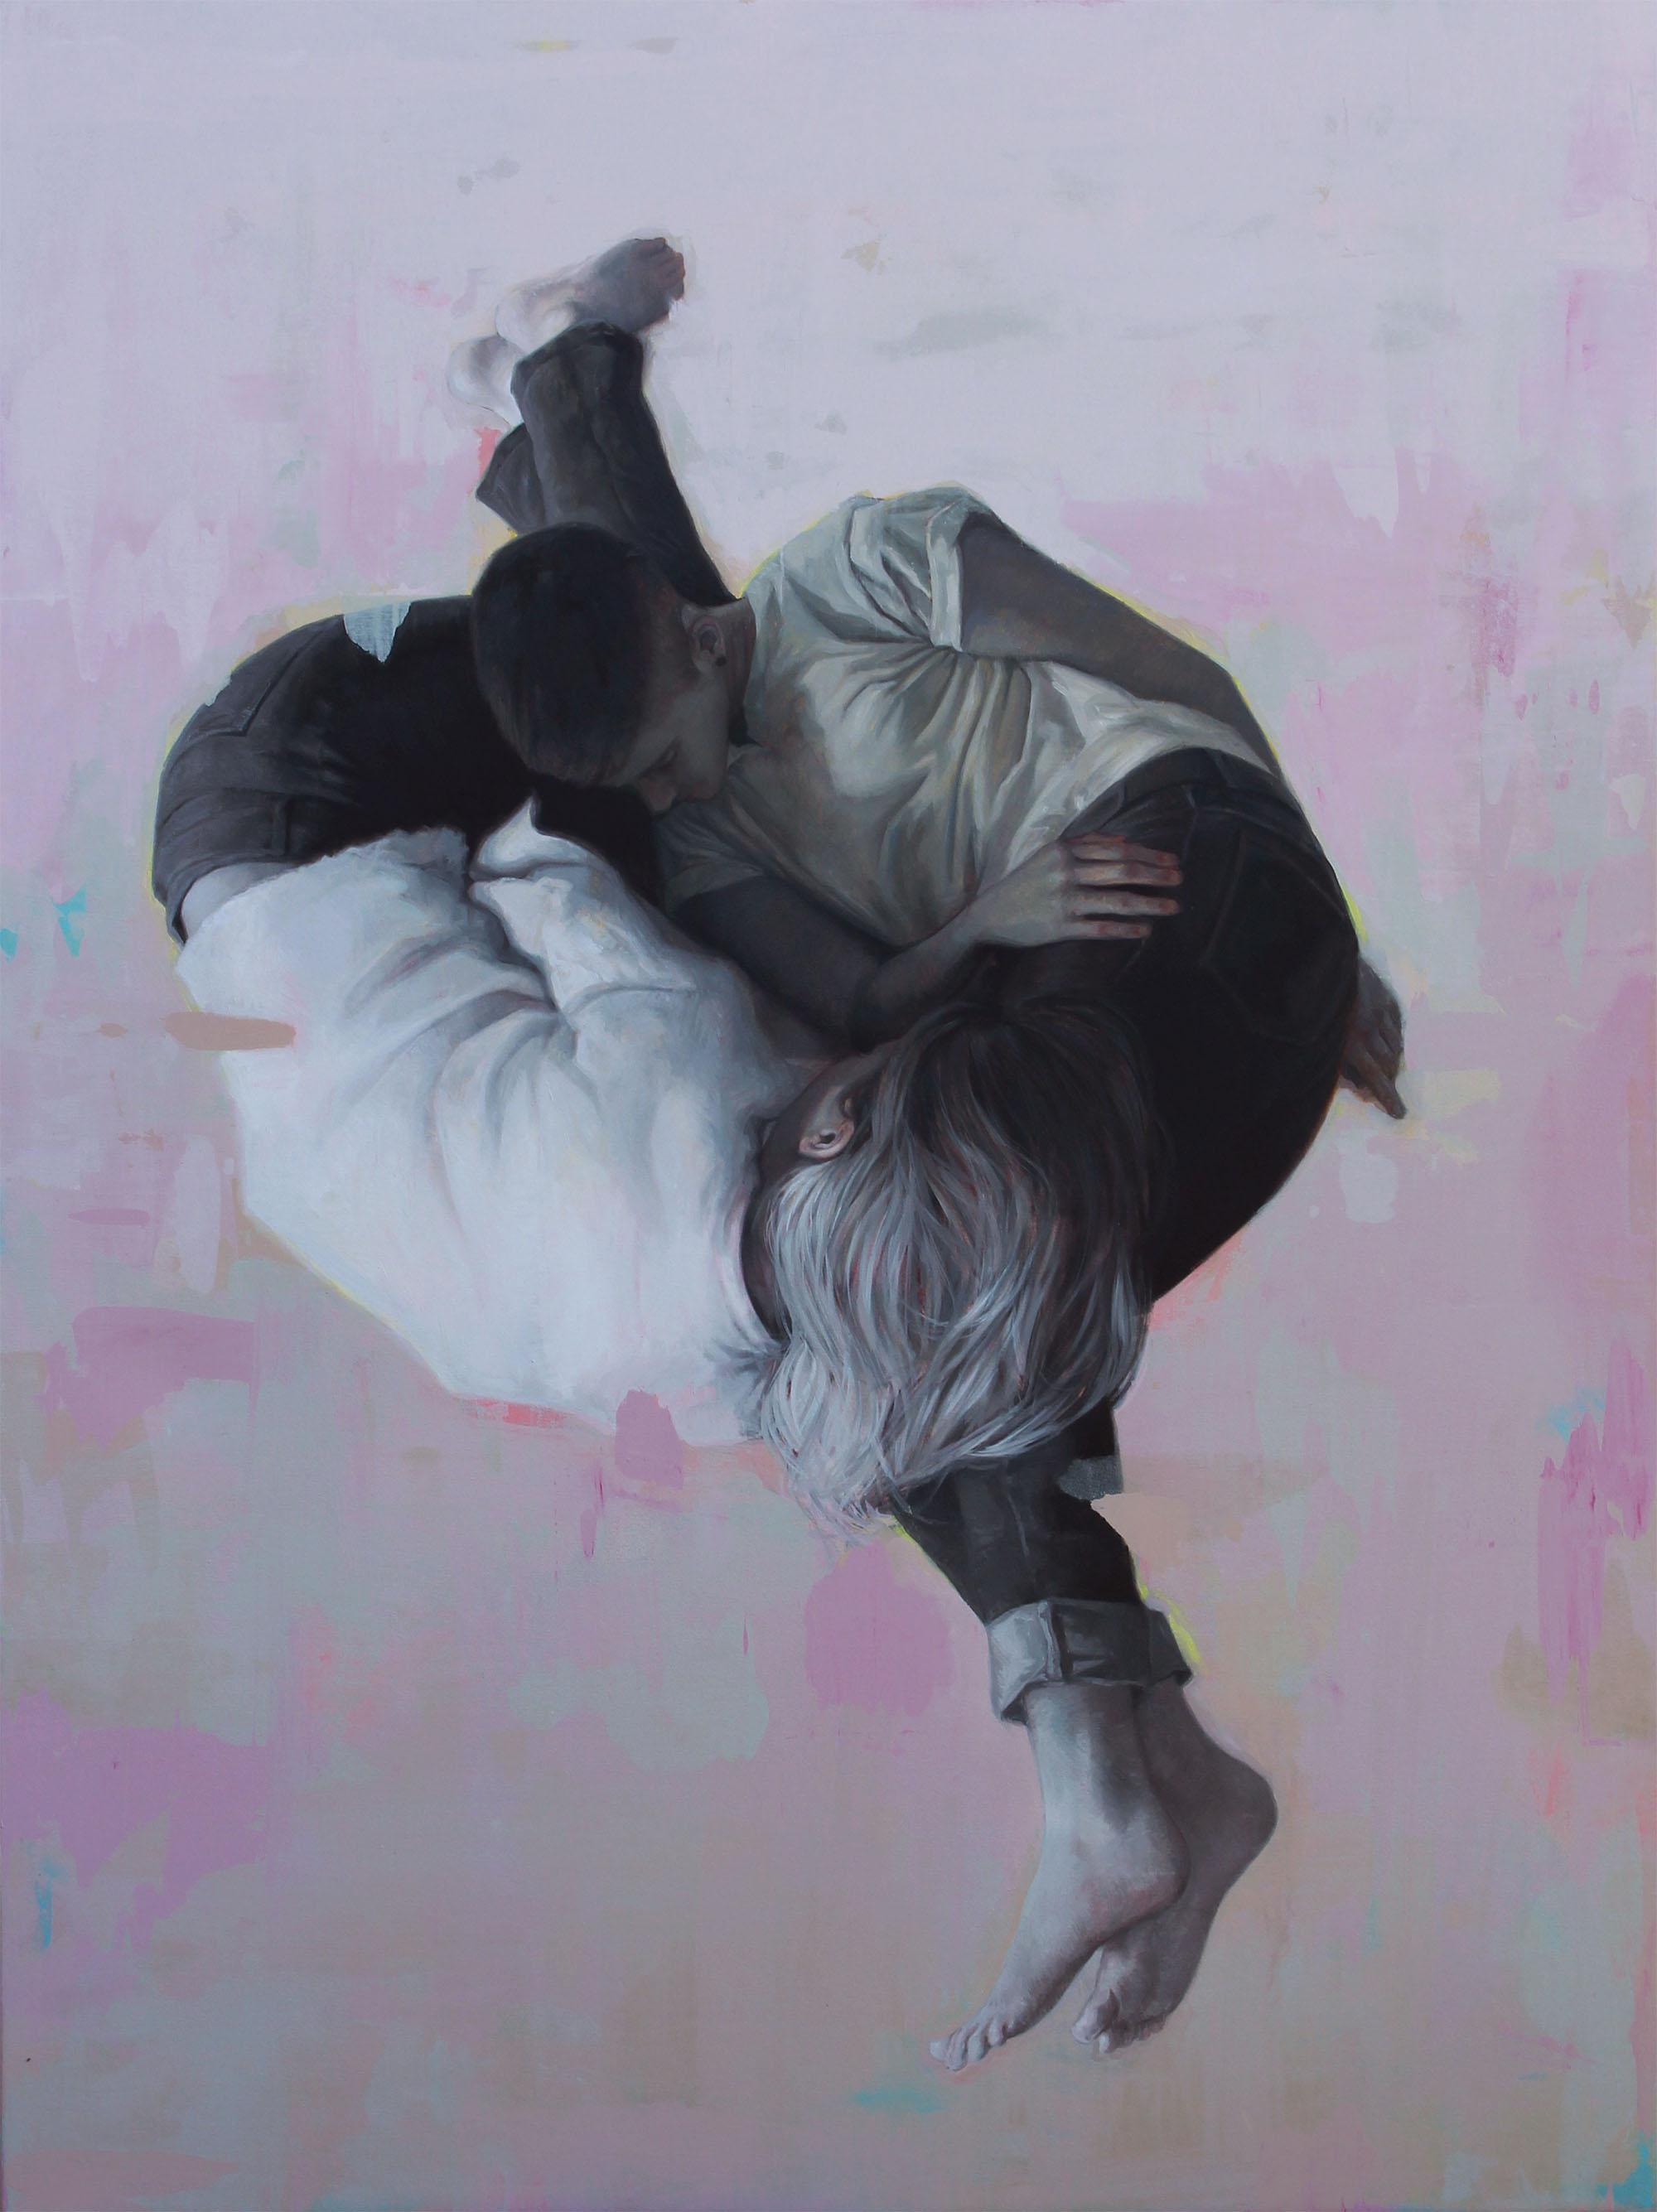 """Articulado"". Oil on canvas, 68""x48"". 2019"